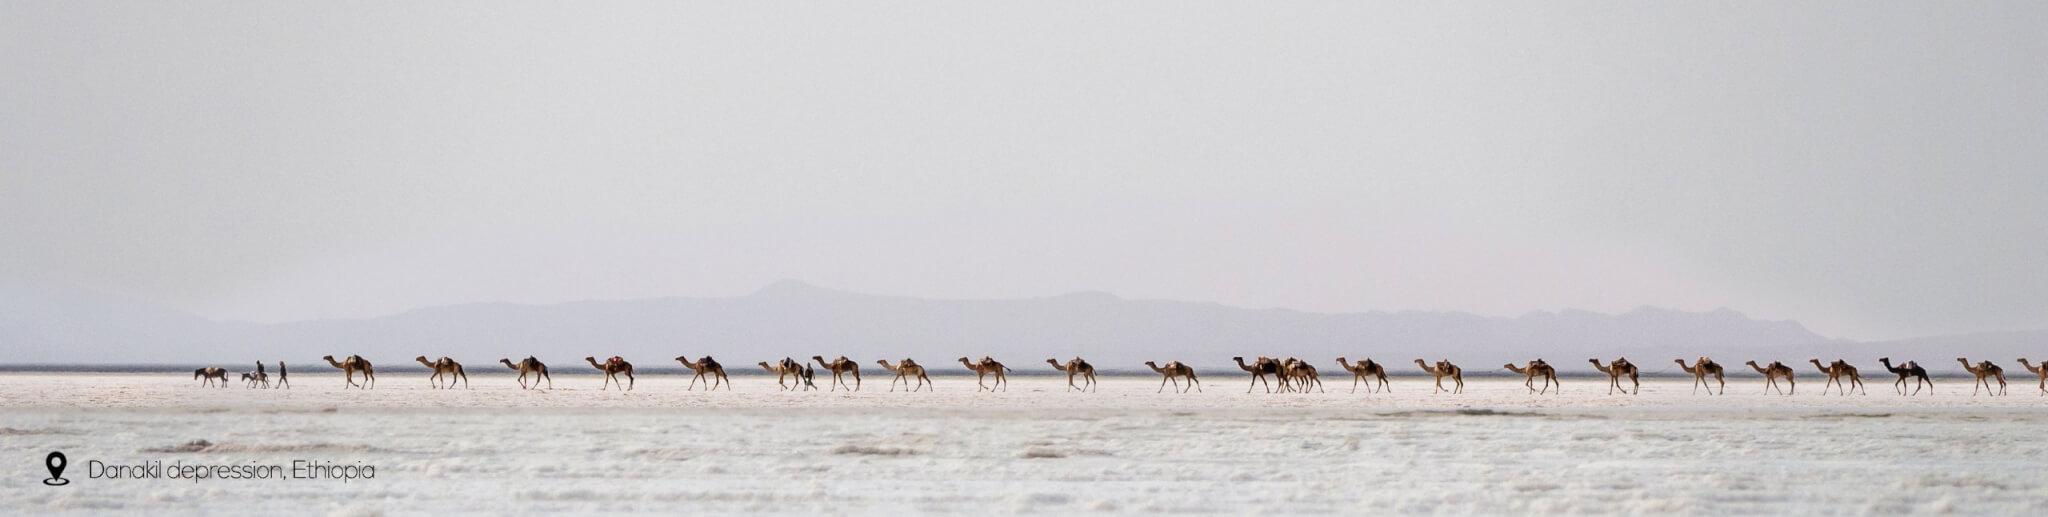 Danakil depression camel caravan